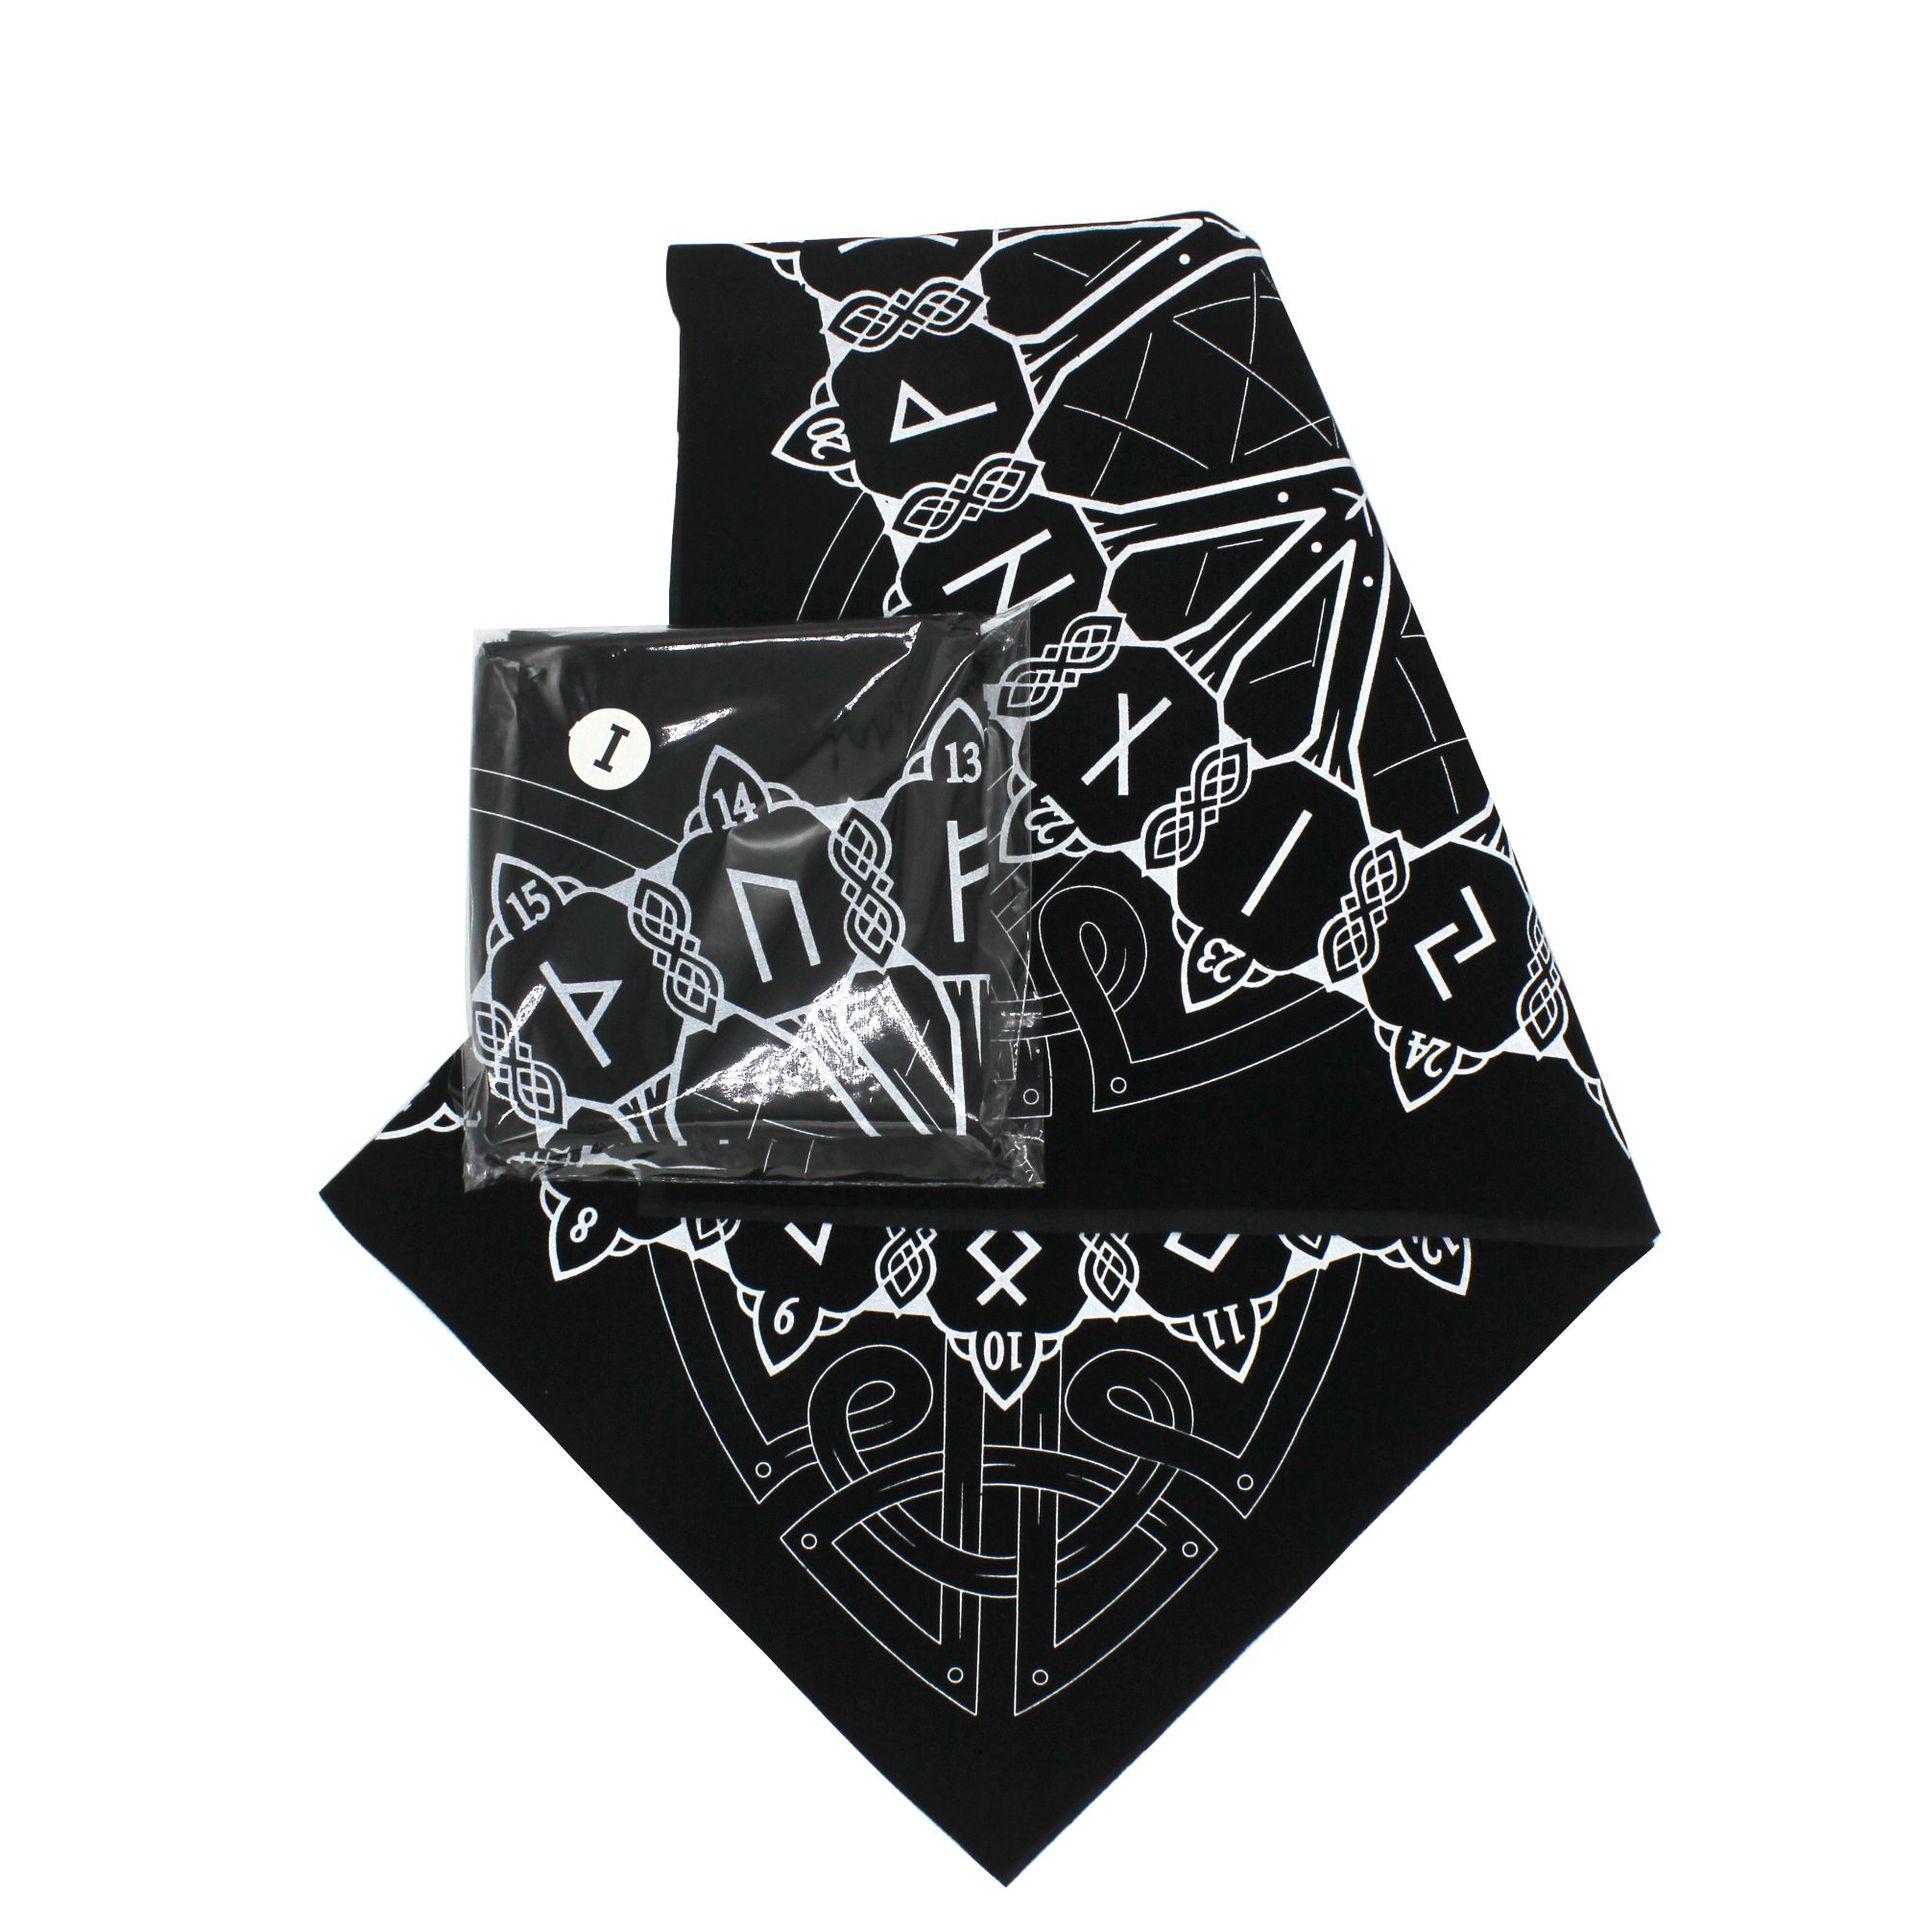 Moon Gazing Hare Pouch: Tarot Bag Celtic Britain D/&D DnD Dice Bag Moongazing Hare Wicca Full Moon Runes Bag Pagan Altar Tarot Pouch